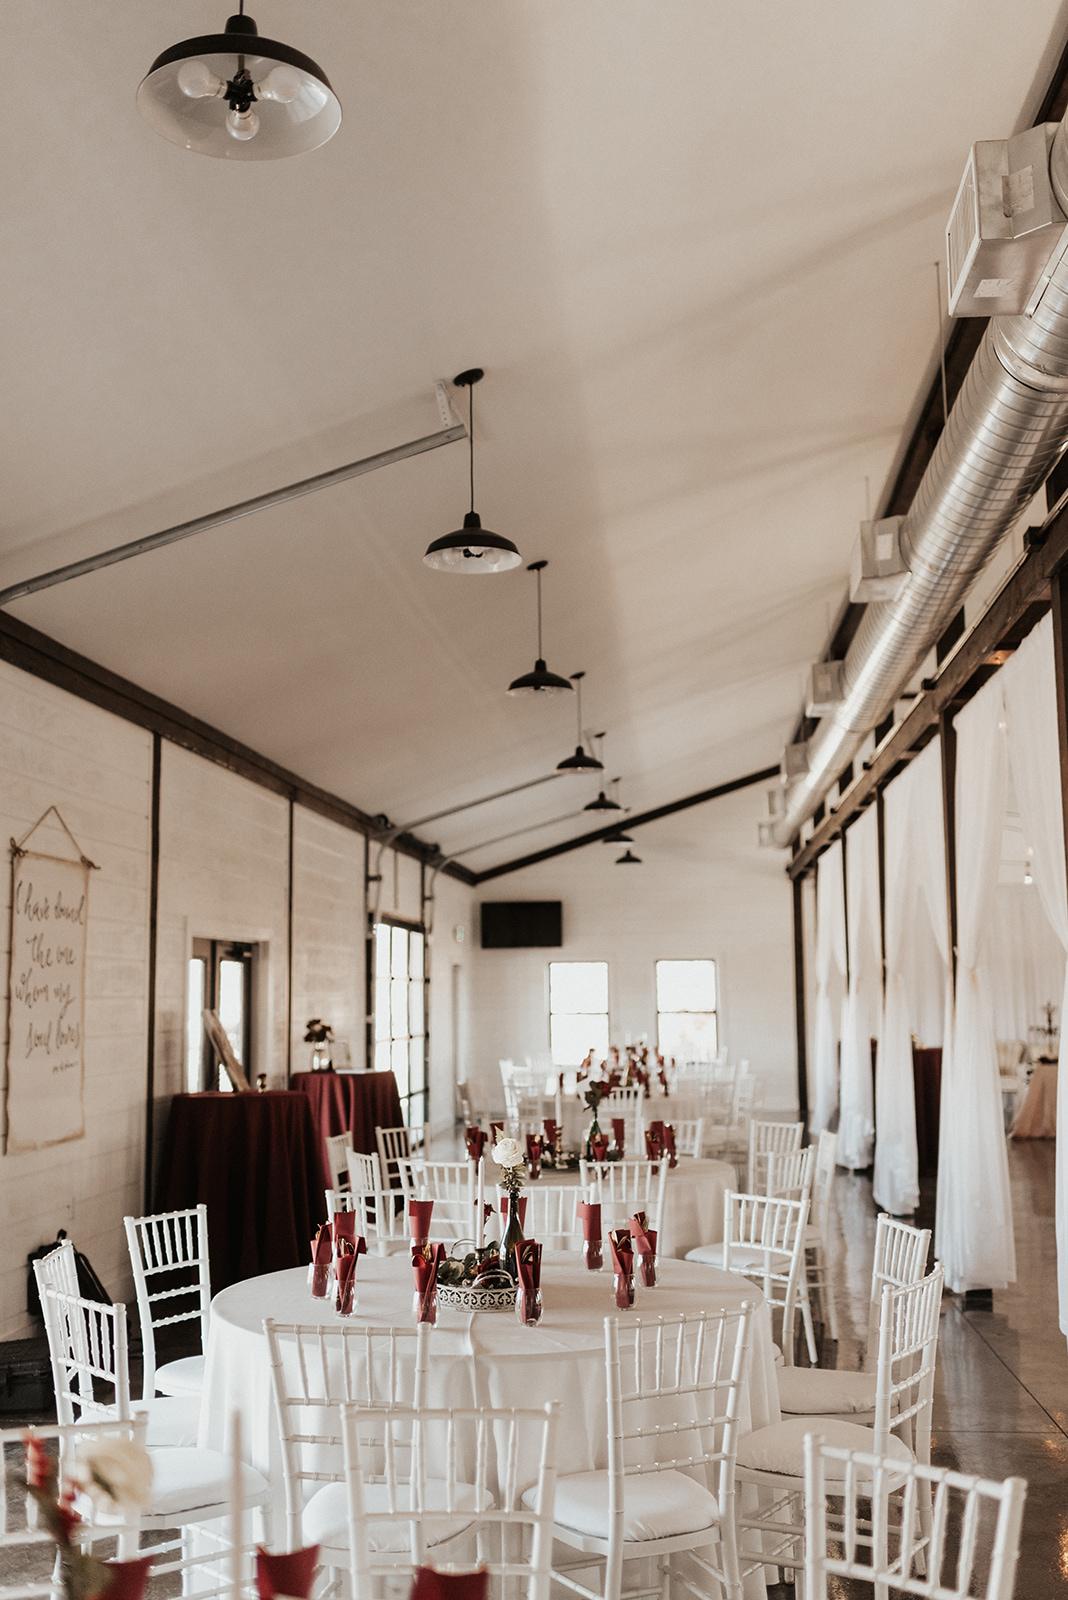 Best Wedding Venue in Tulsa Bixby Dream Point Ranch 36.jpg